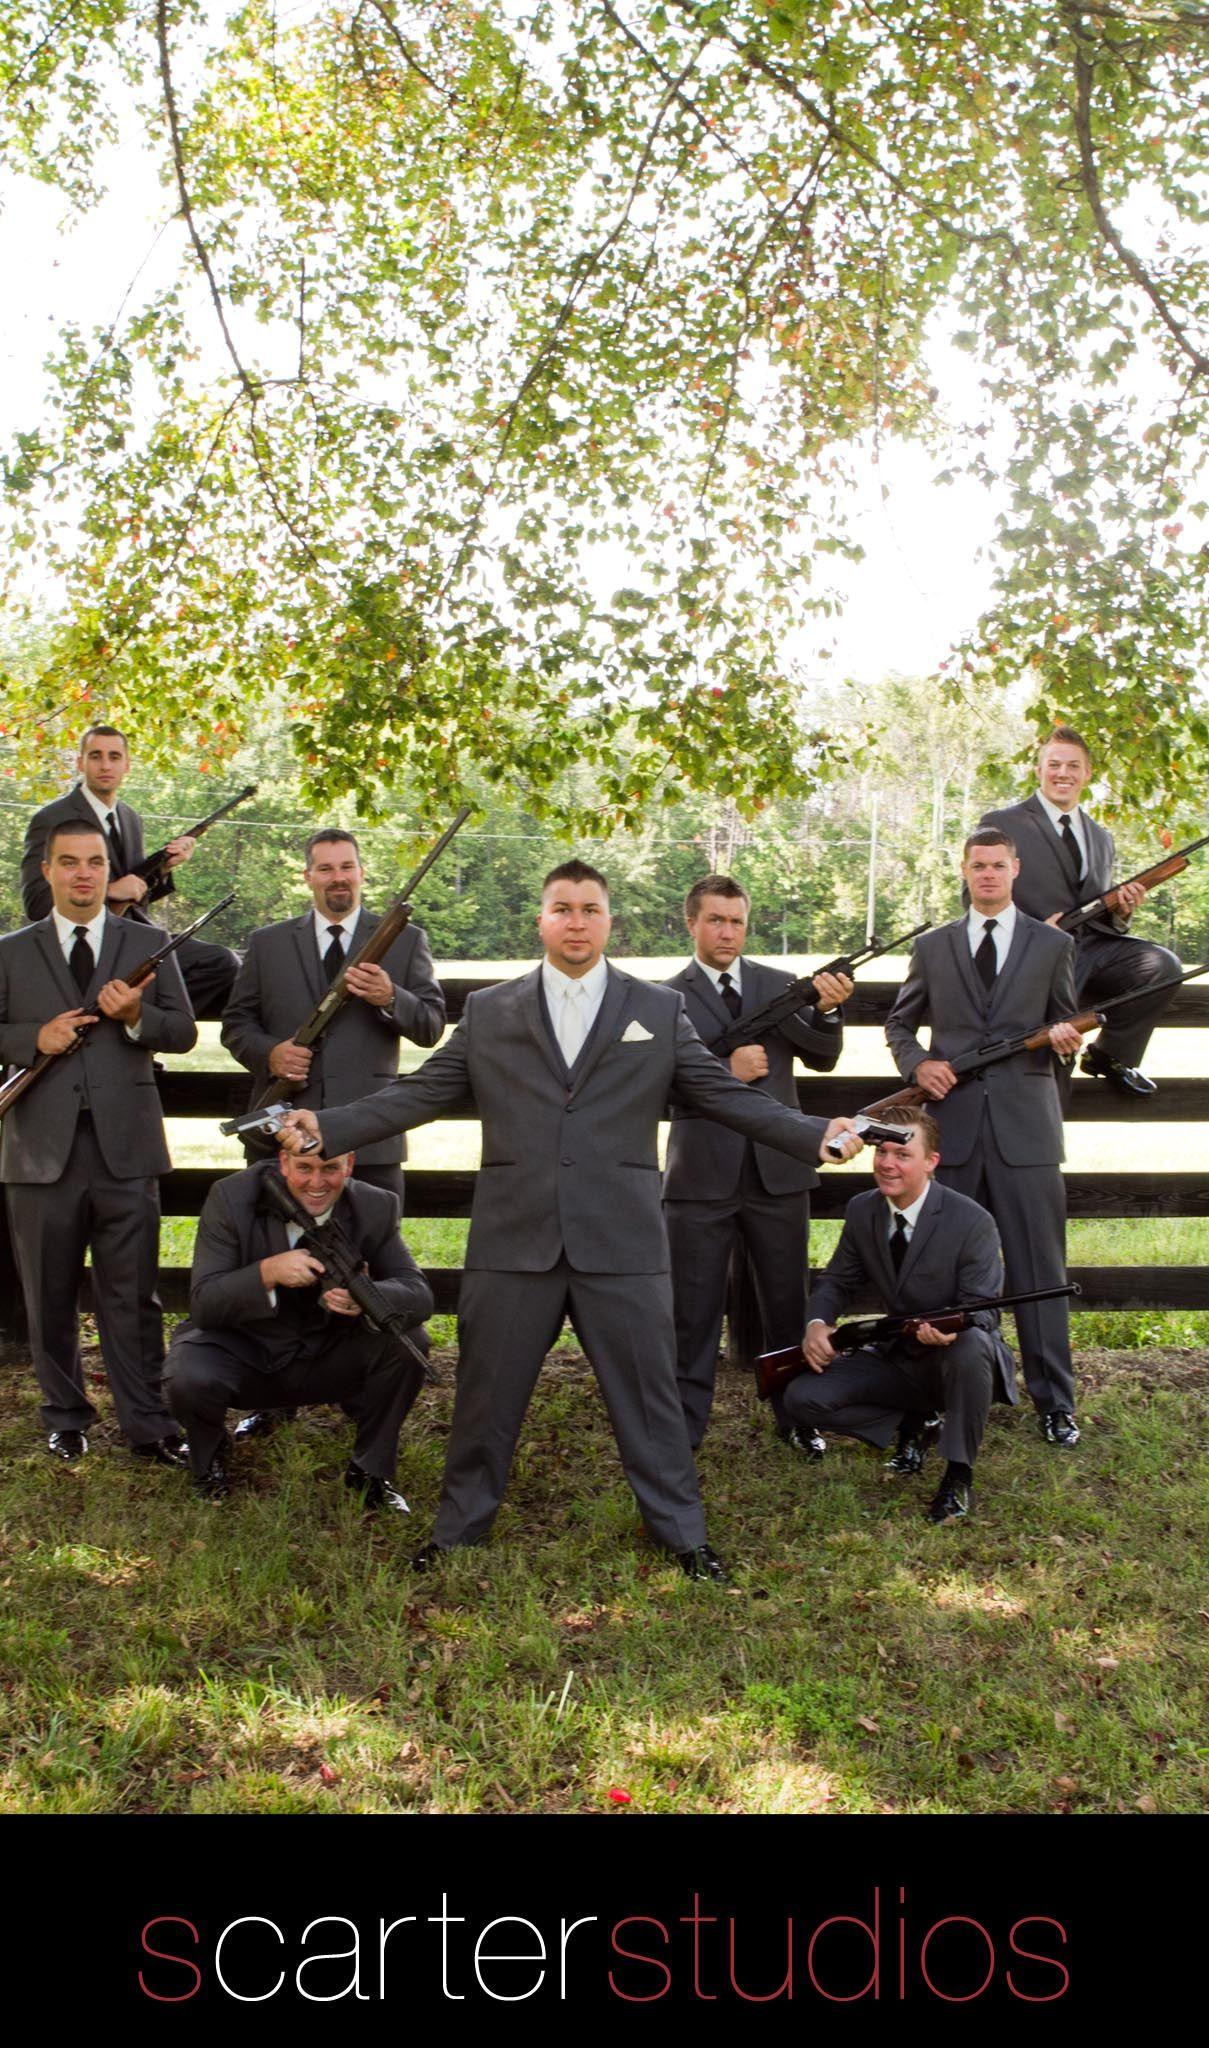 locked and loaded groomsmen with guns / www.scarterstudios.com